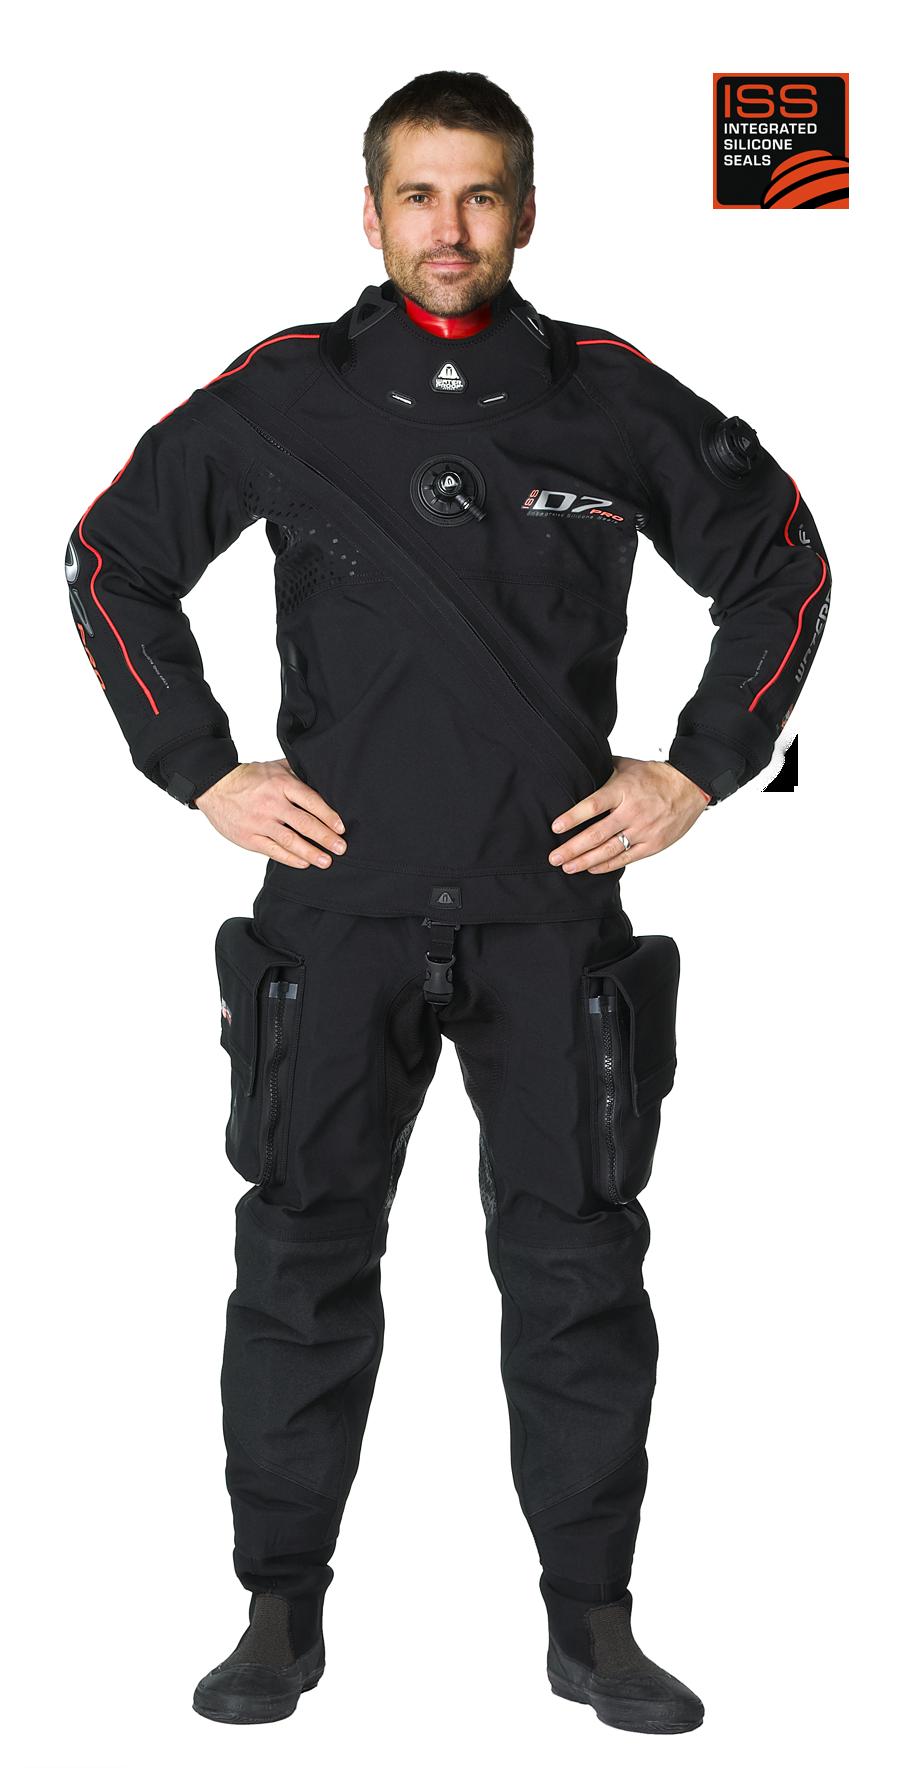 Сух водолазен костюм D7 PRO ISS - Waterproof